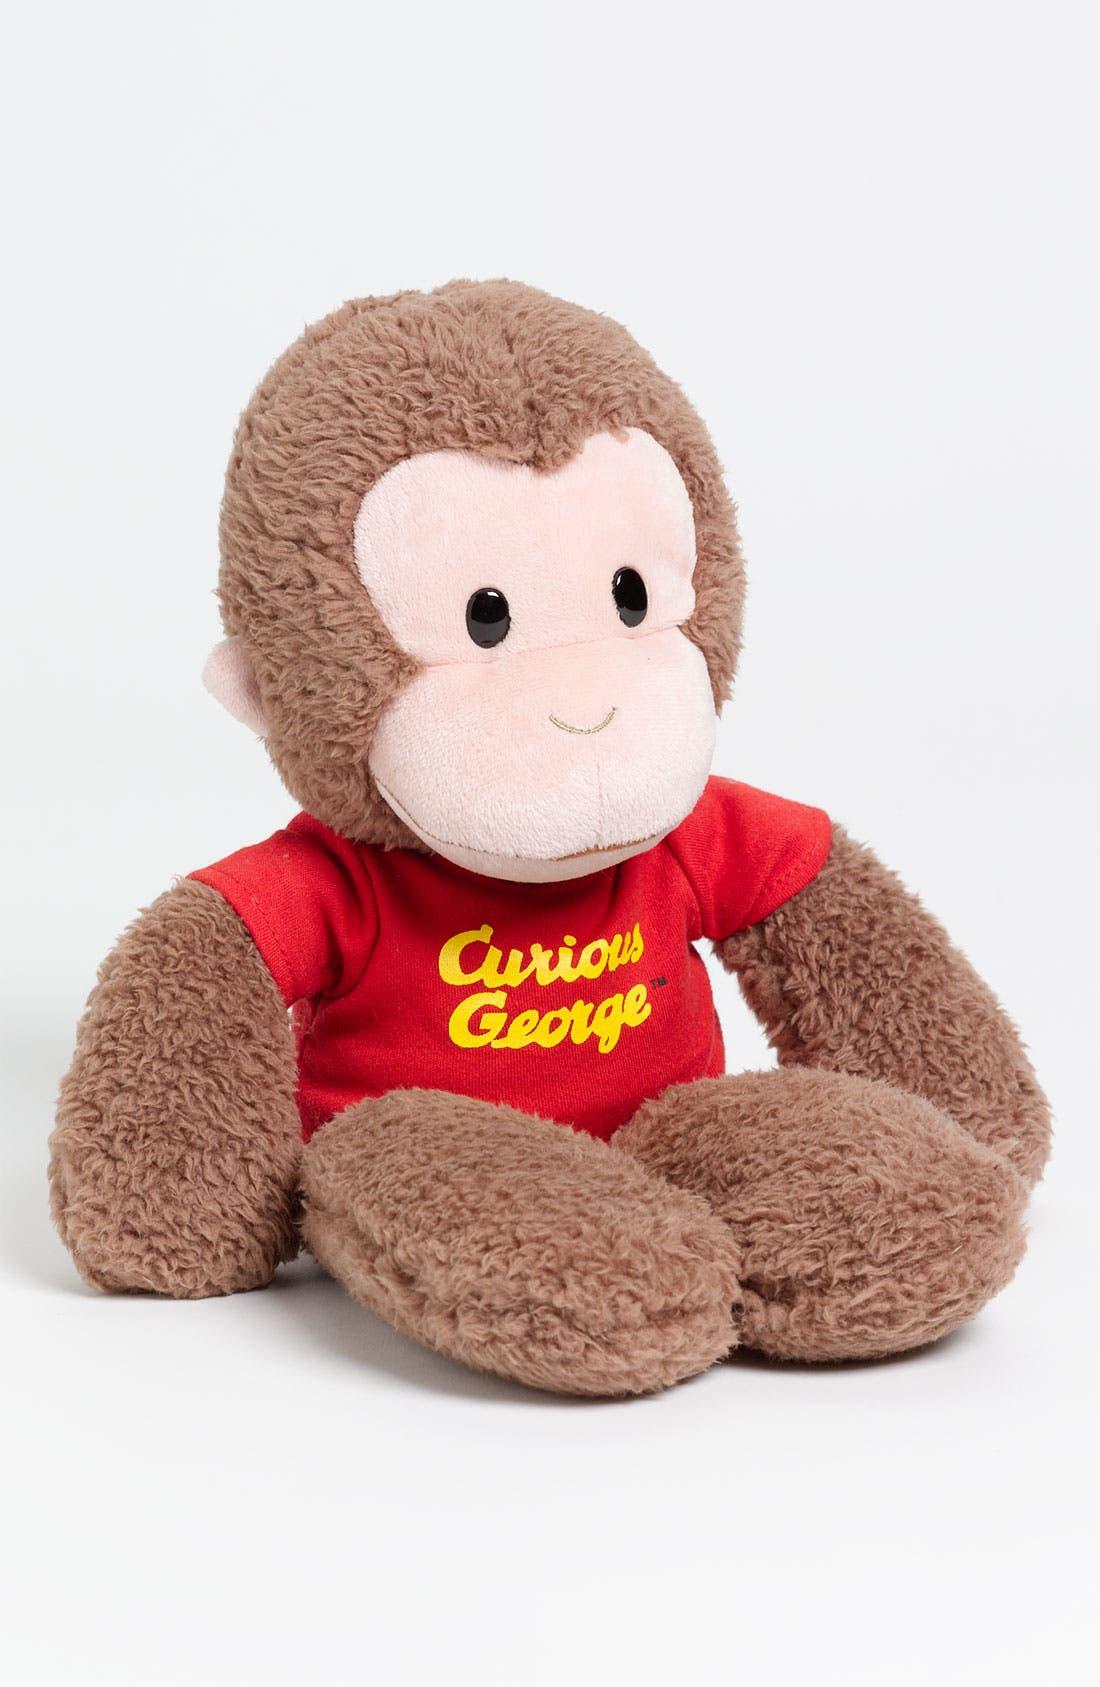 'Curious George<sup>®</sup>' Stuffed Animal,                             Main thumbnail 1, color,                             200